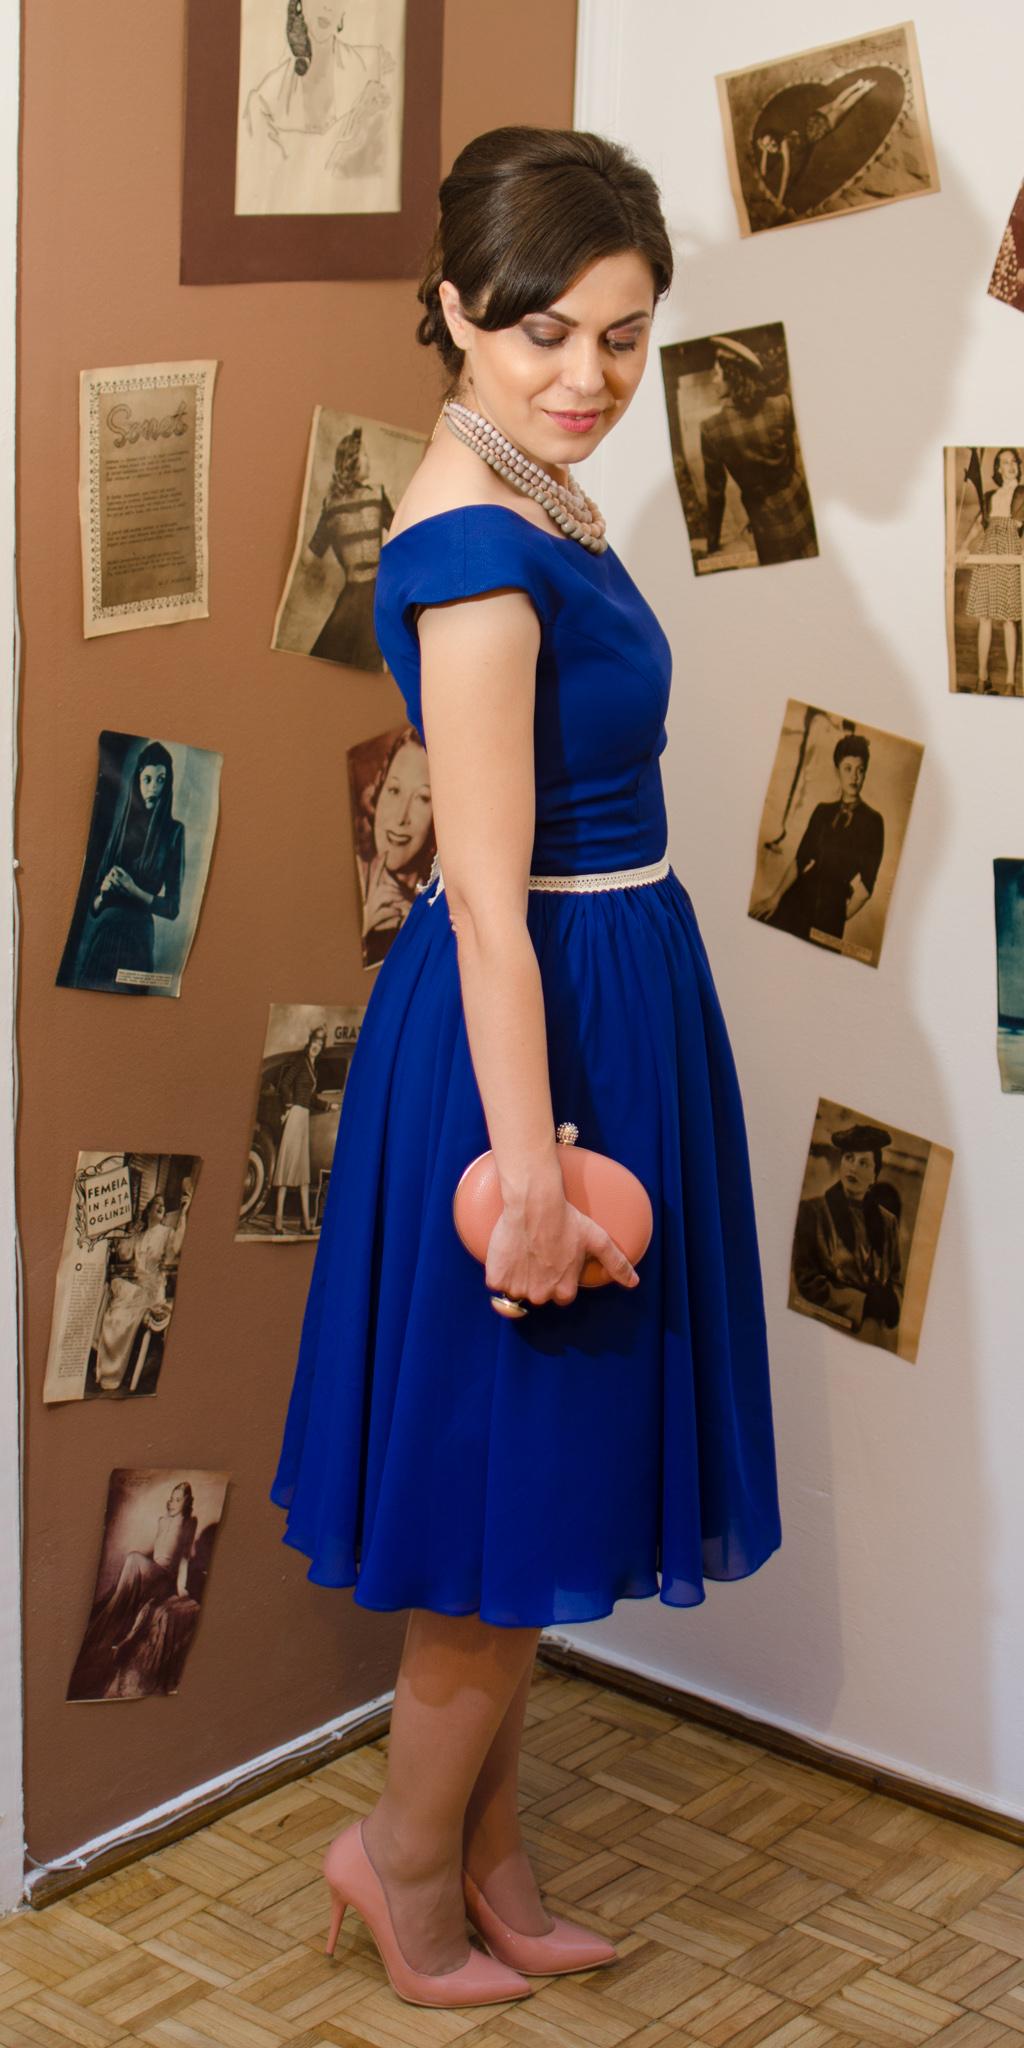 50s diva style cobalt blue dress sheer flowy chiffon dusty pink heels clutch statement necklace vintage retro